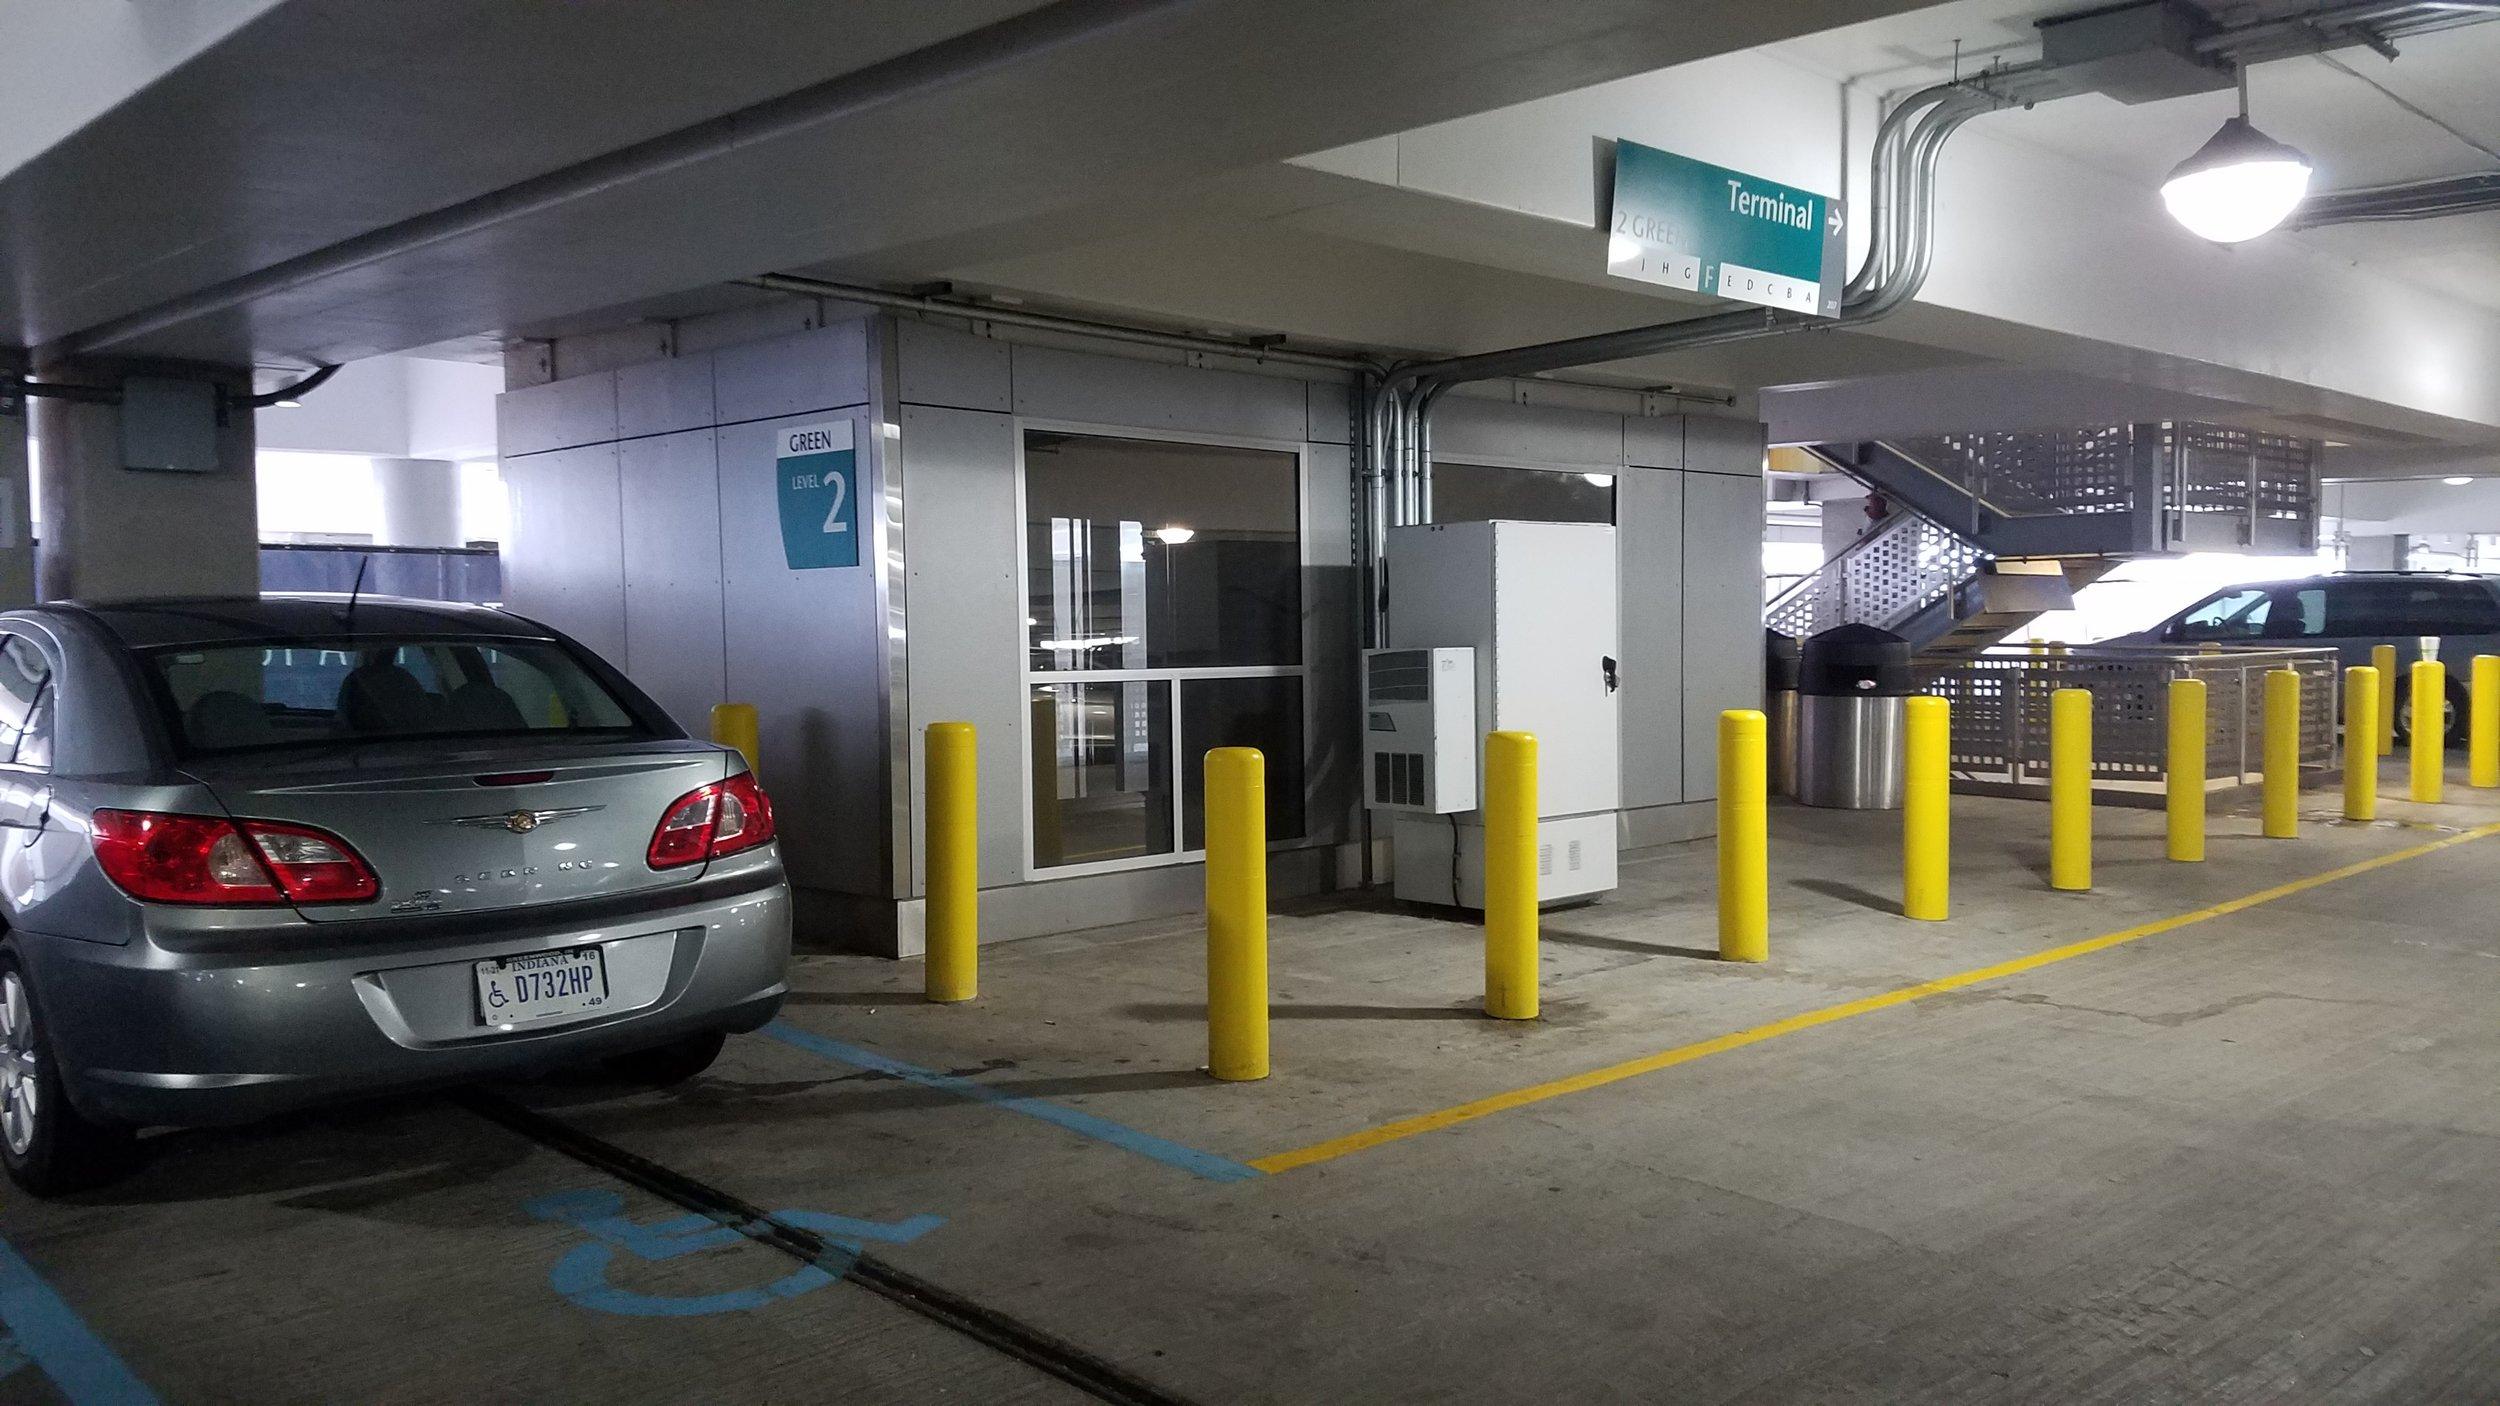 Iaa Parking Garage Improvements 2016 2017 Ce Solutions